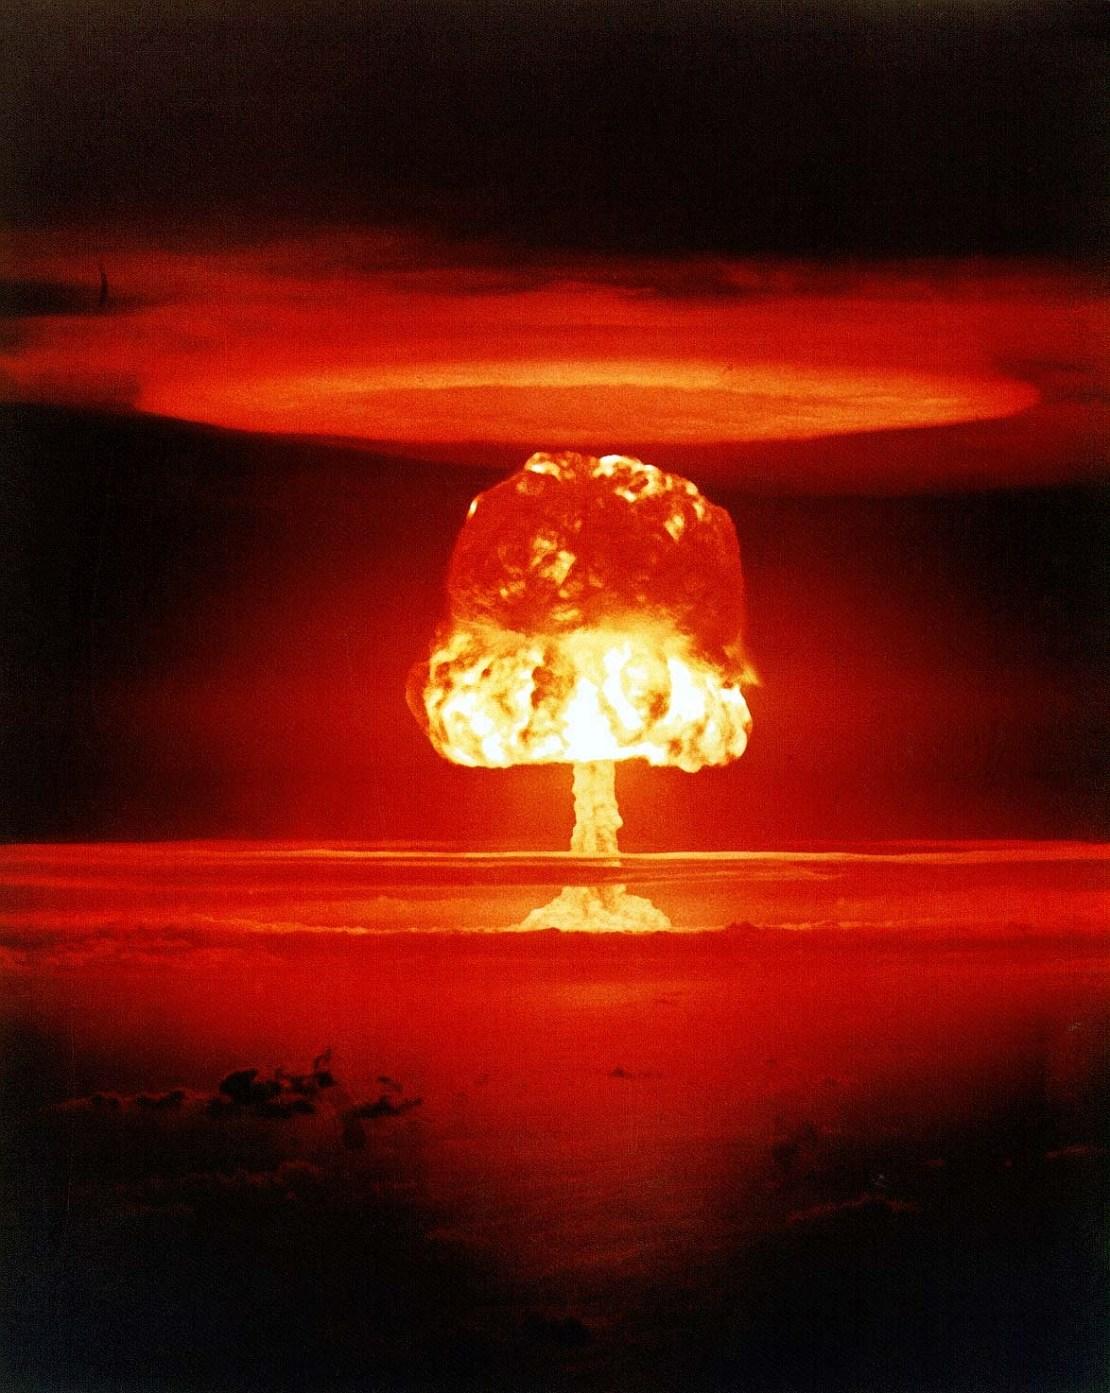 https://i0.wp.com/chamorrobible.org/images/photos/gpw-20050304-UnitedStatesDepartmentOfEnergy-XX-33-thermonuclear-hydrogen-bomb-Operation-Castle-ROMEO-Event-Bikini-Atoll-Marshall-Islands-19540327-large.jpg?w=1110